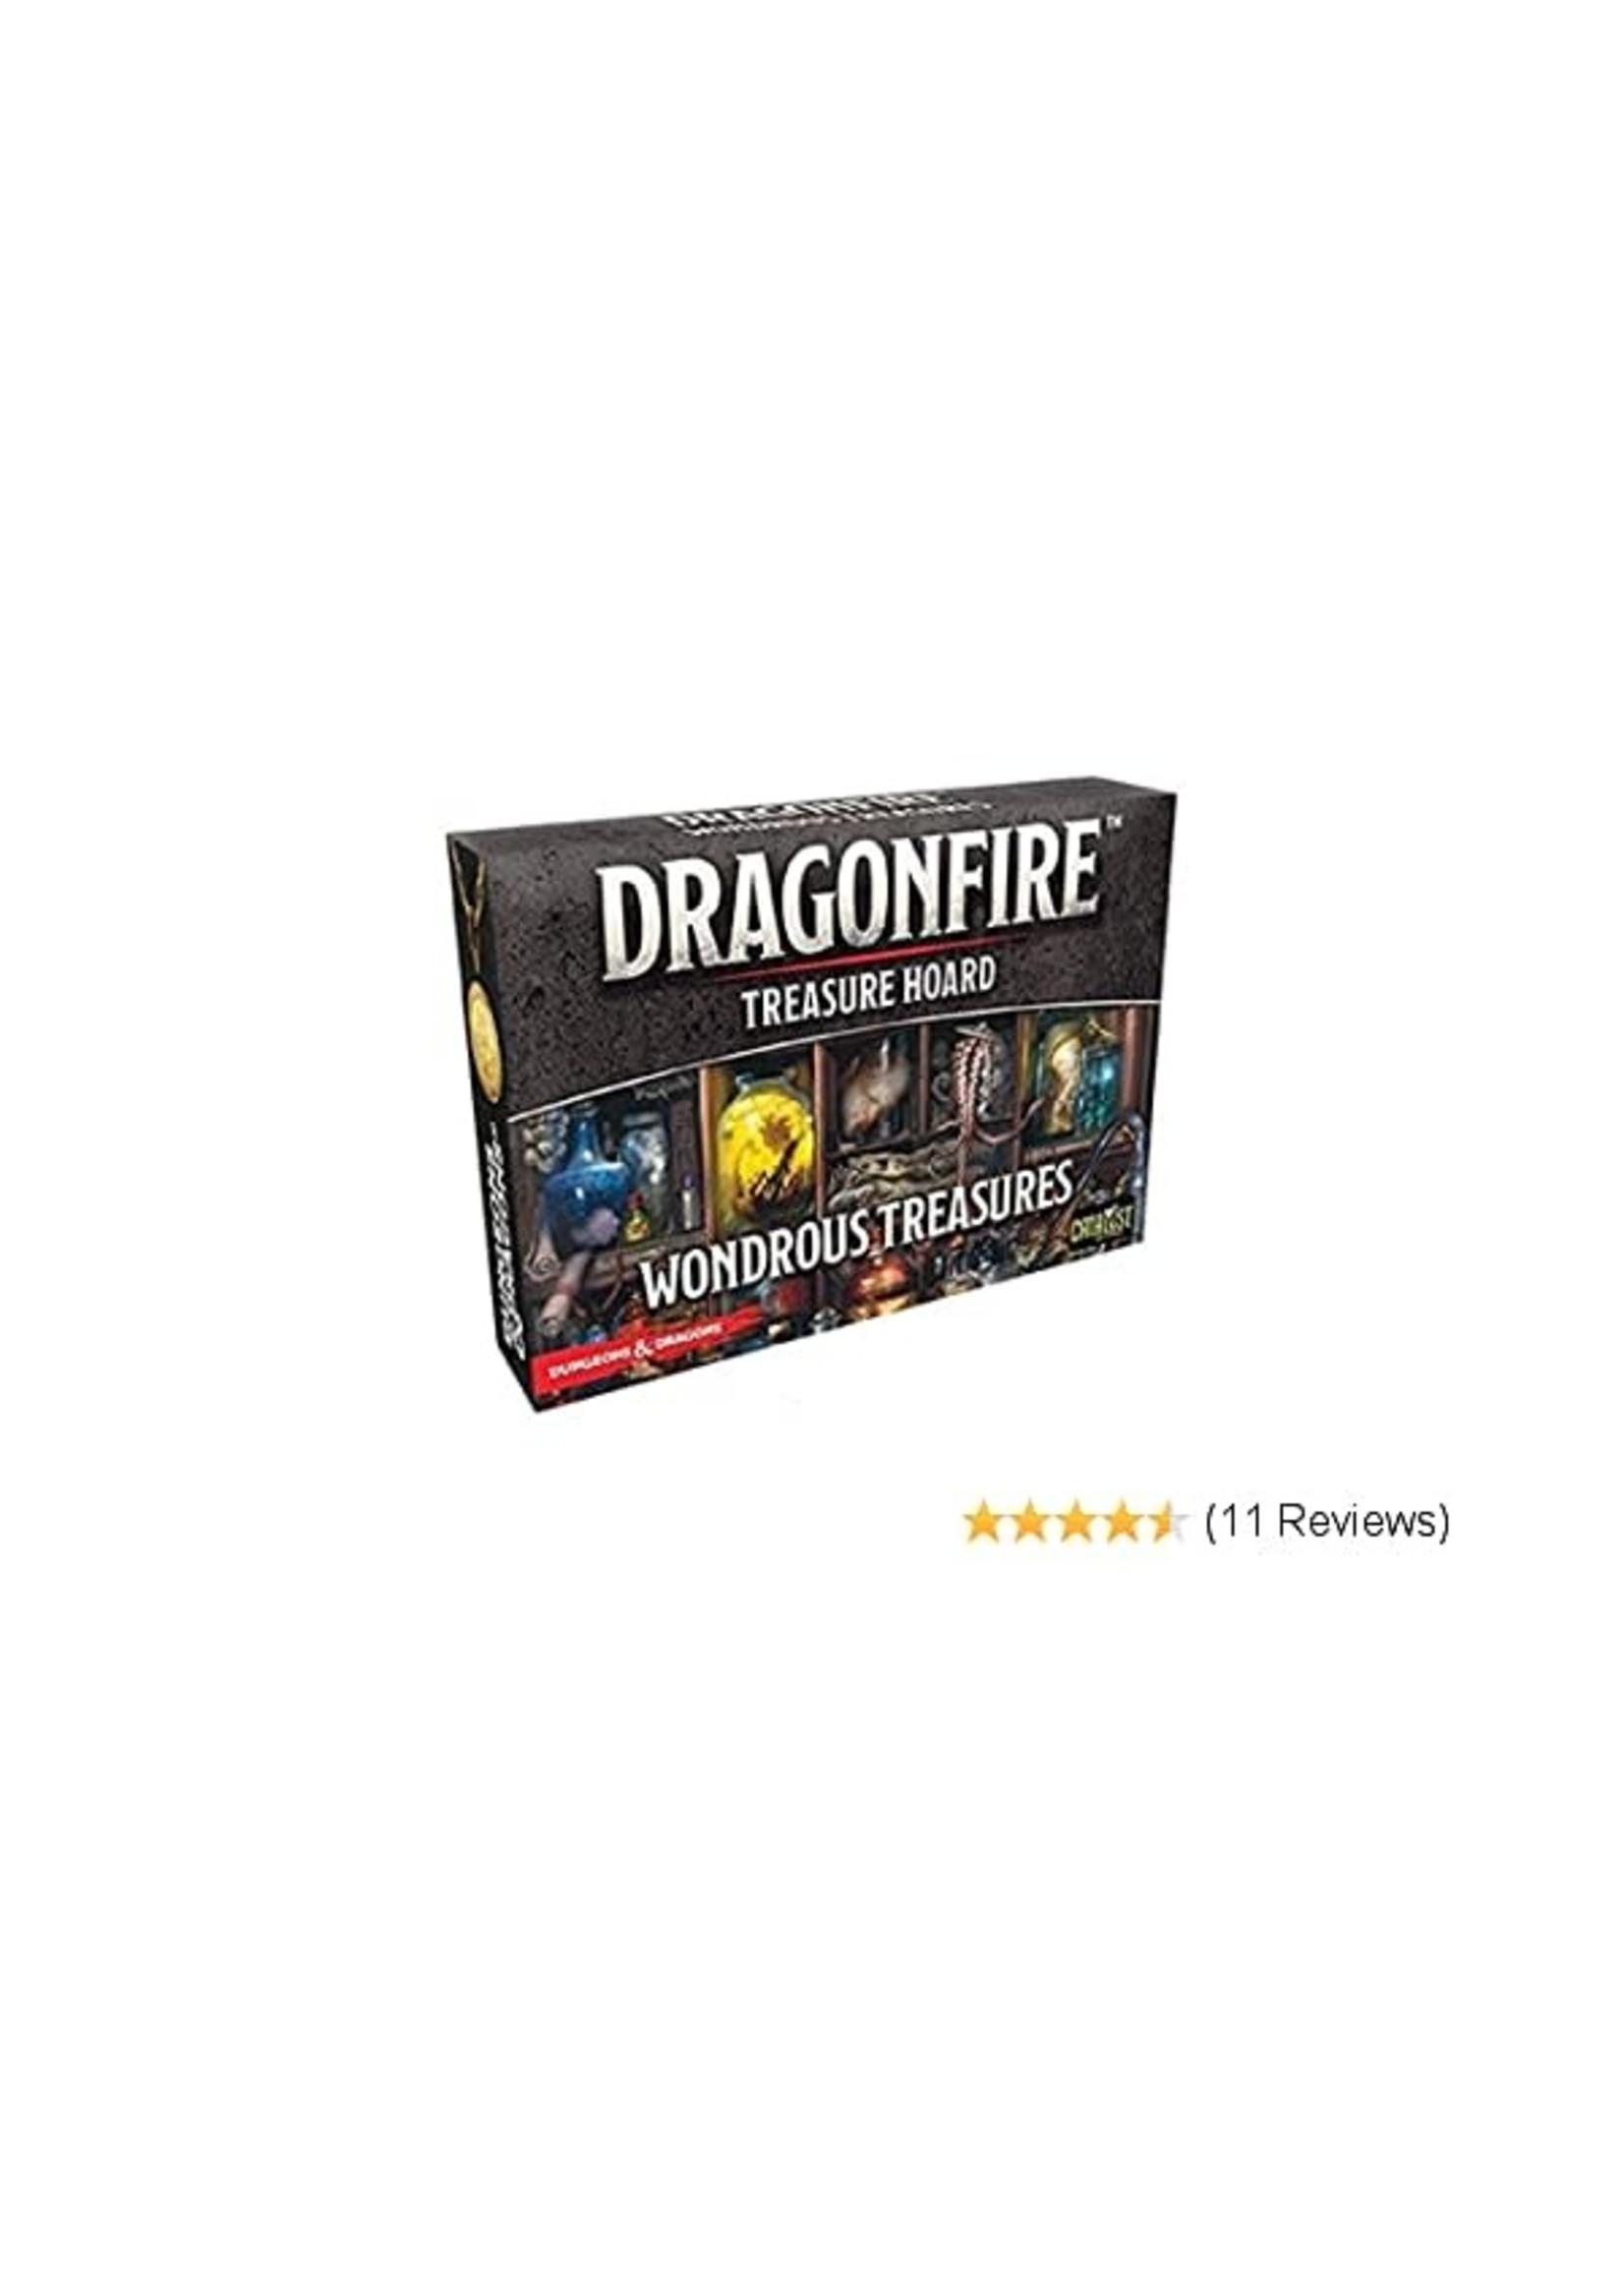 Dragonfire DBG Magic Item Deck 1:  Wonderous Treasures